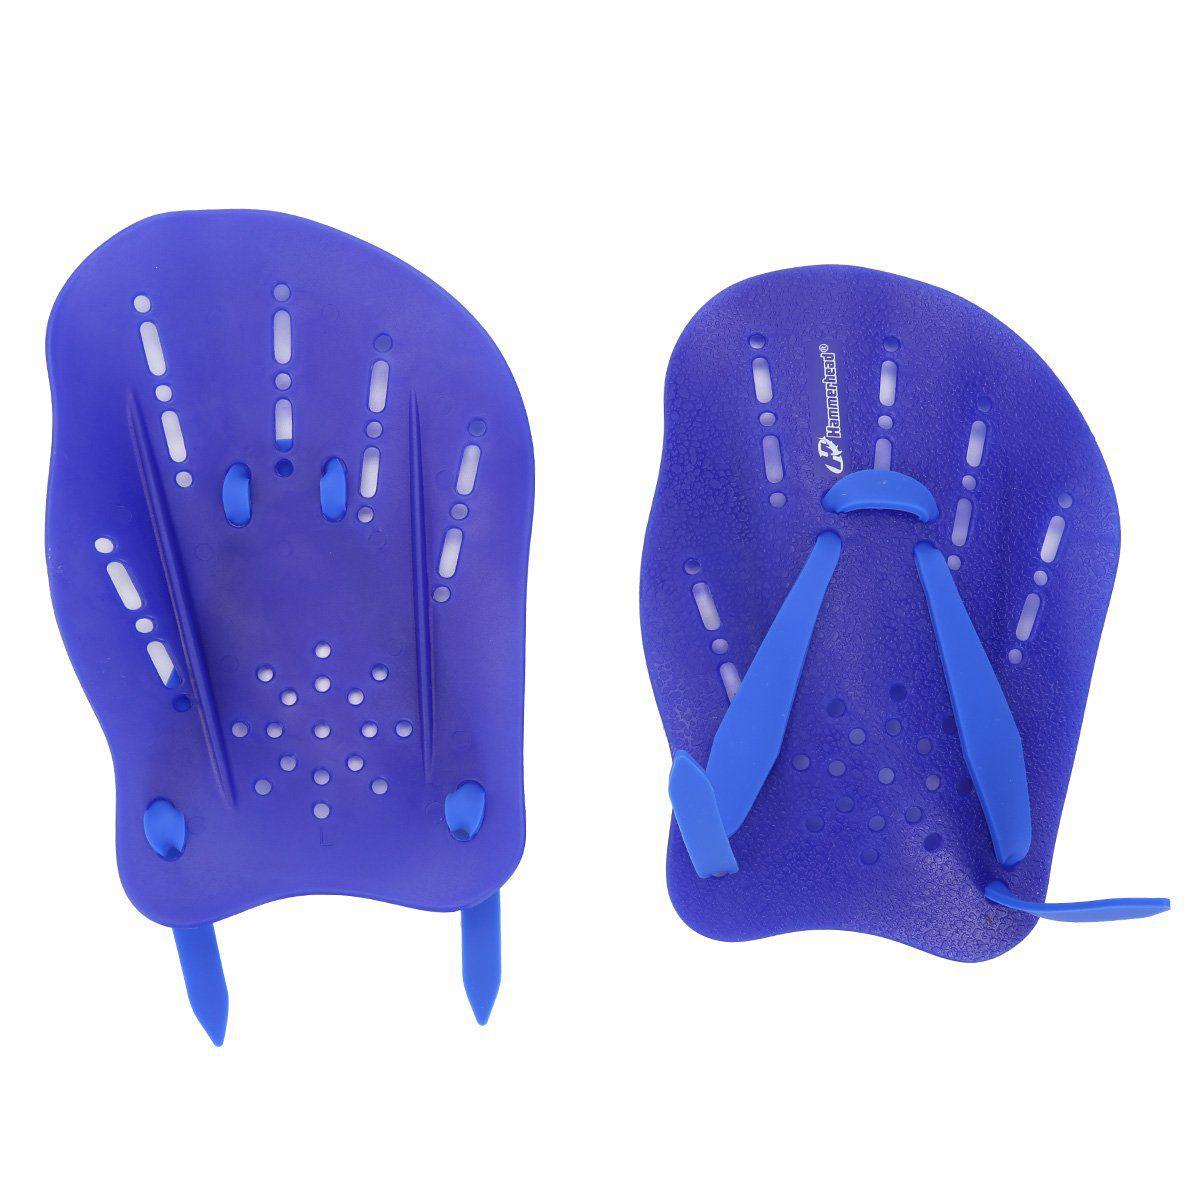 Palmar Hammerhead Hand Paddle 2 - Azul Royal  - REAL ESPORTE